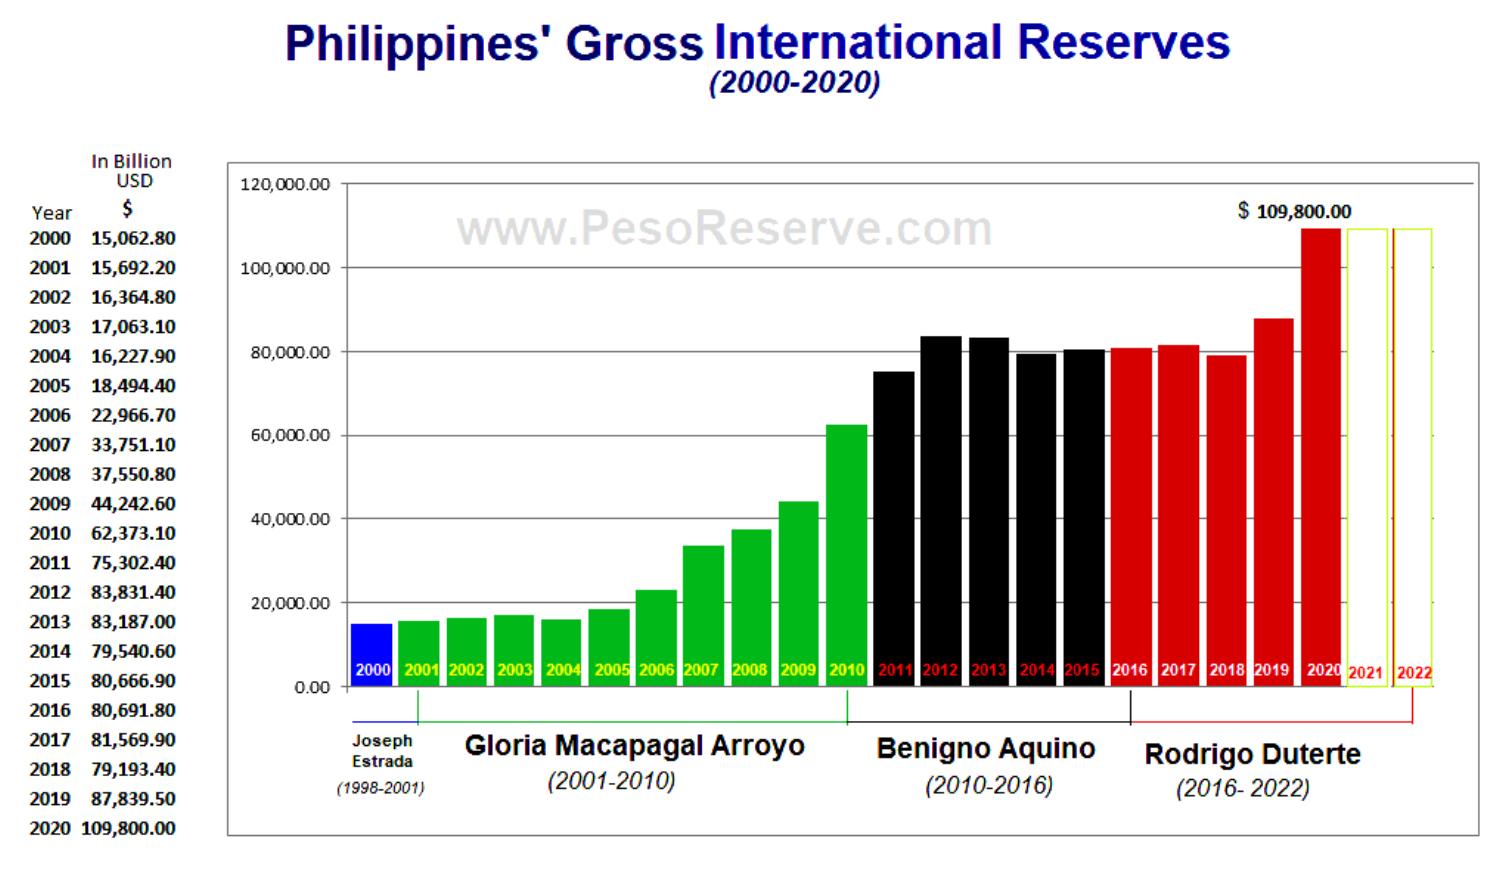 Philippines Gross International Reserves Reached $109.8 Billion US Dollars